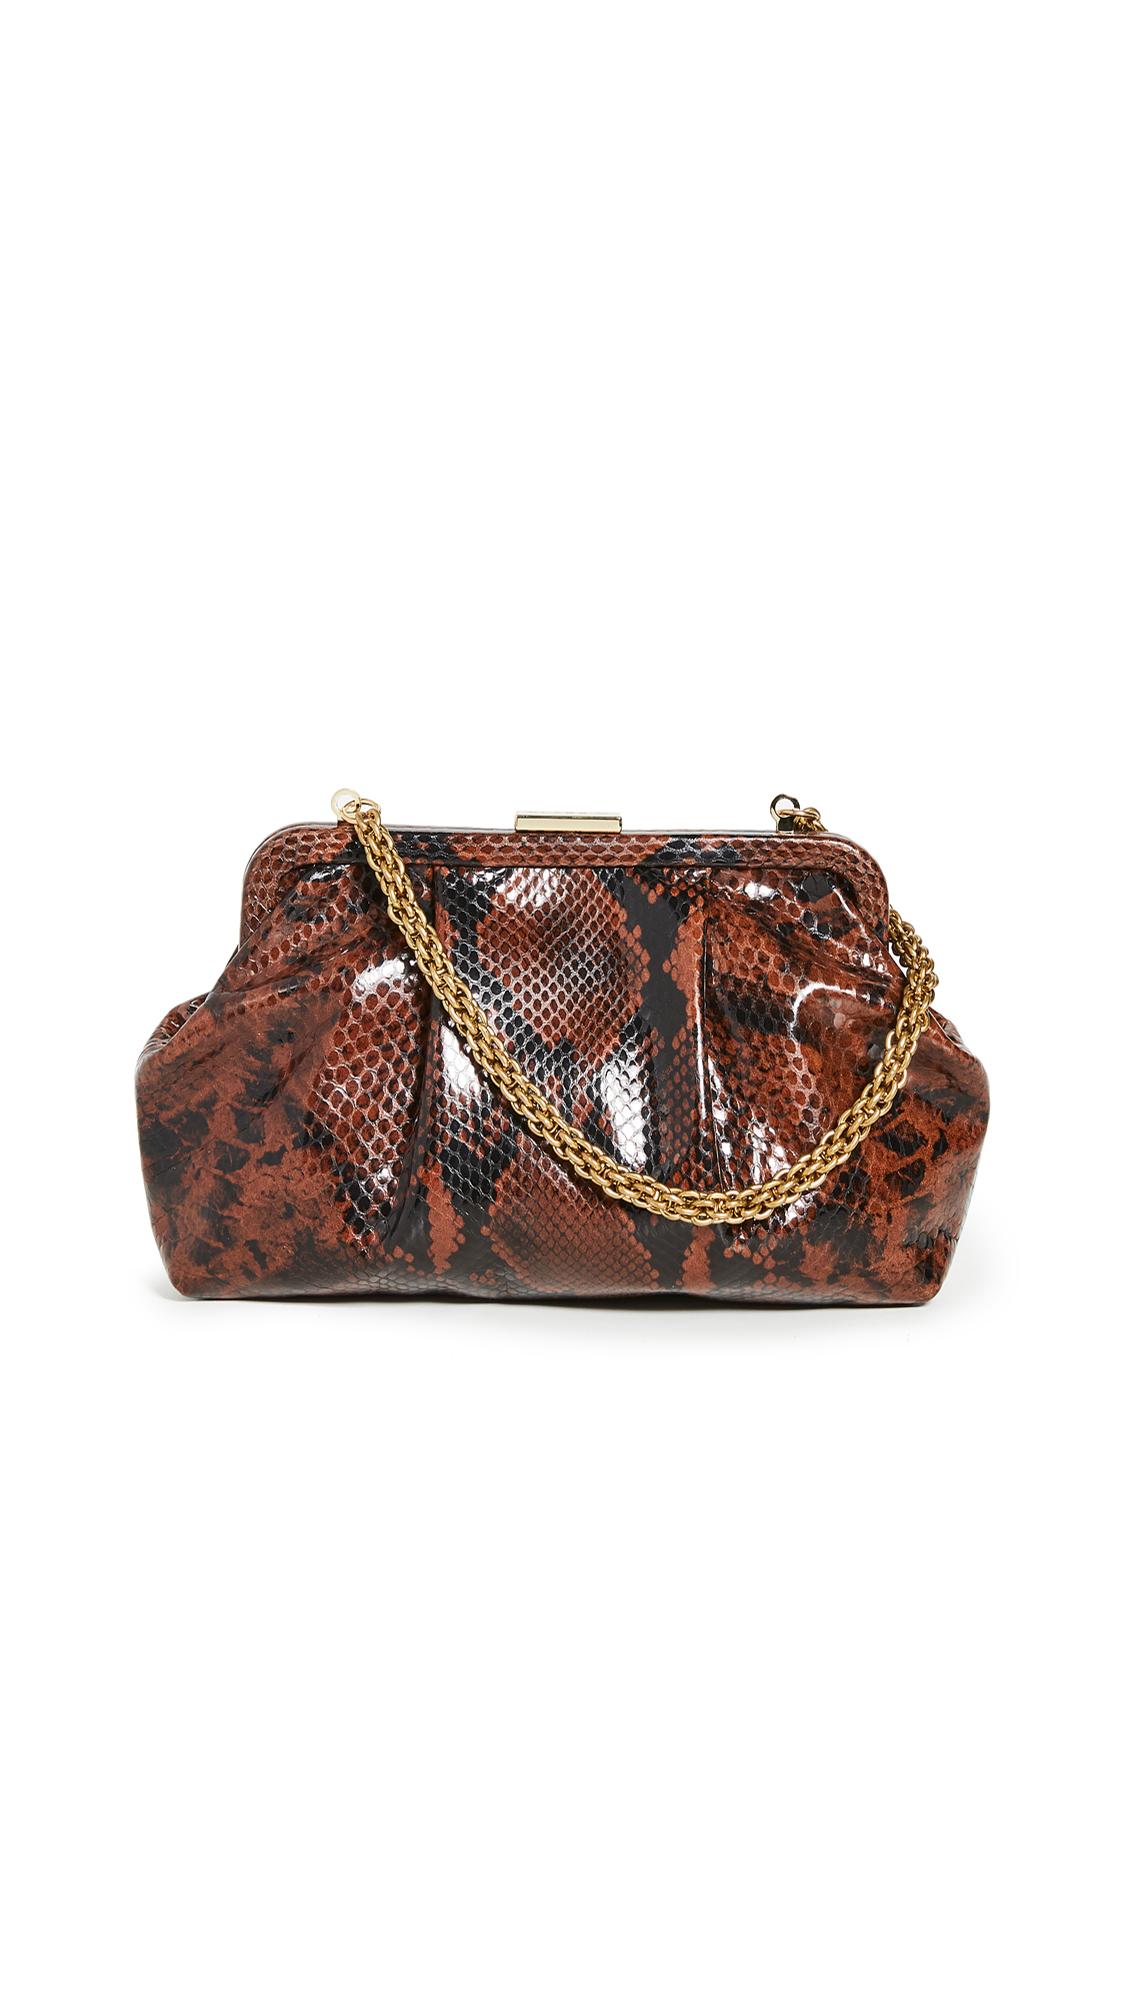 Clare V Bags SISSY BAG